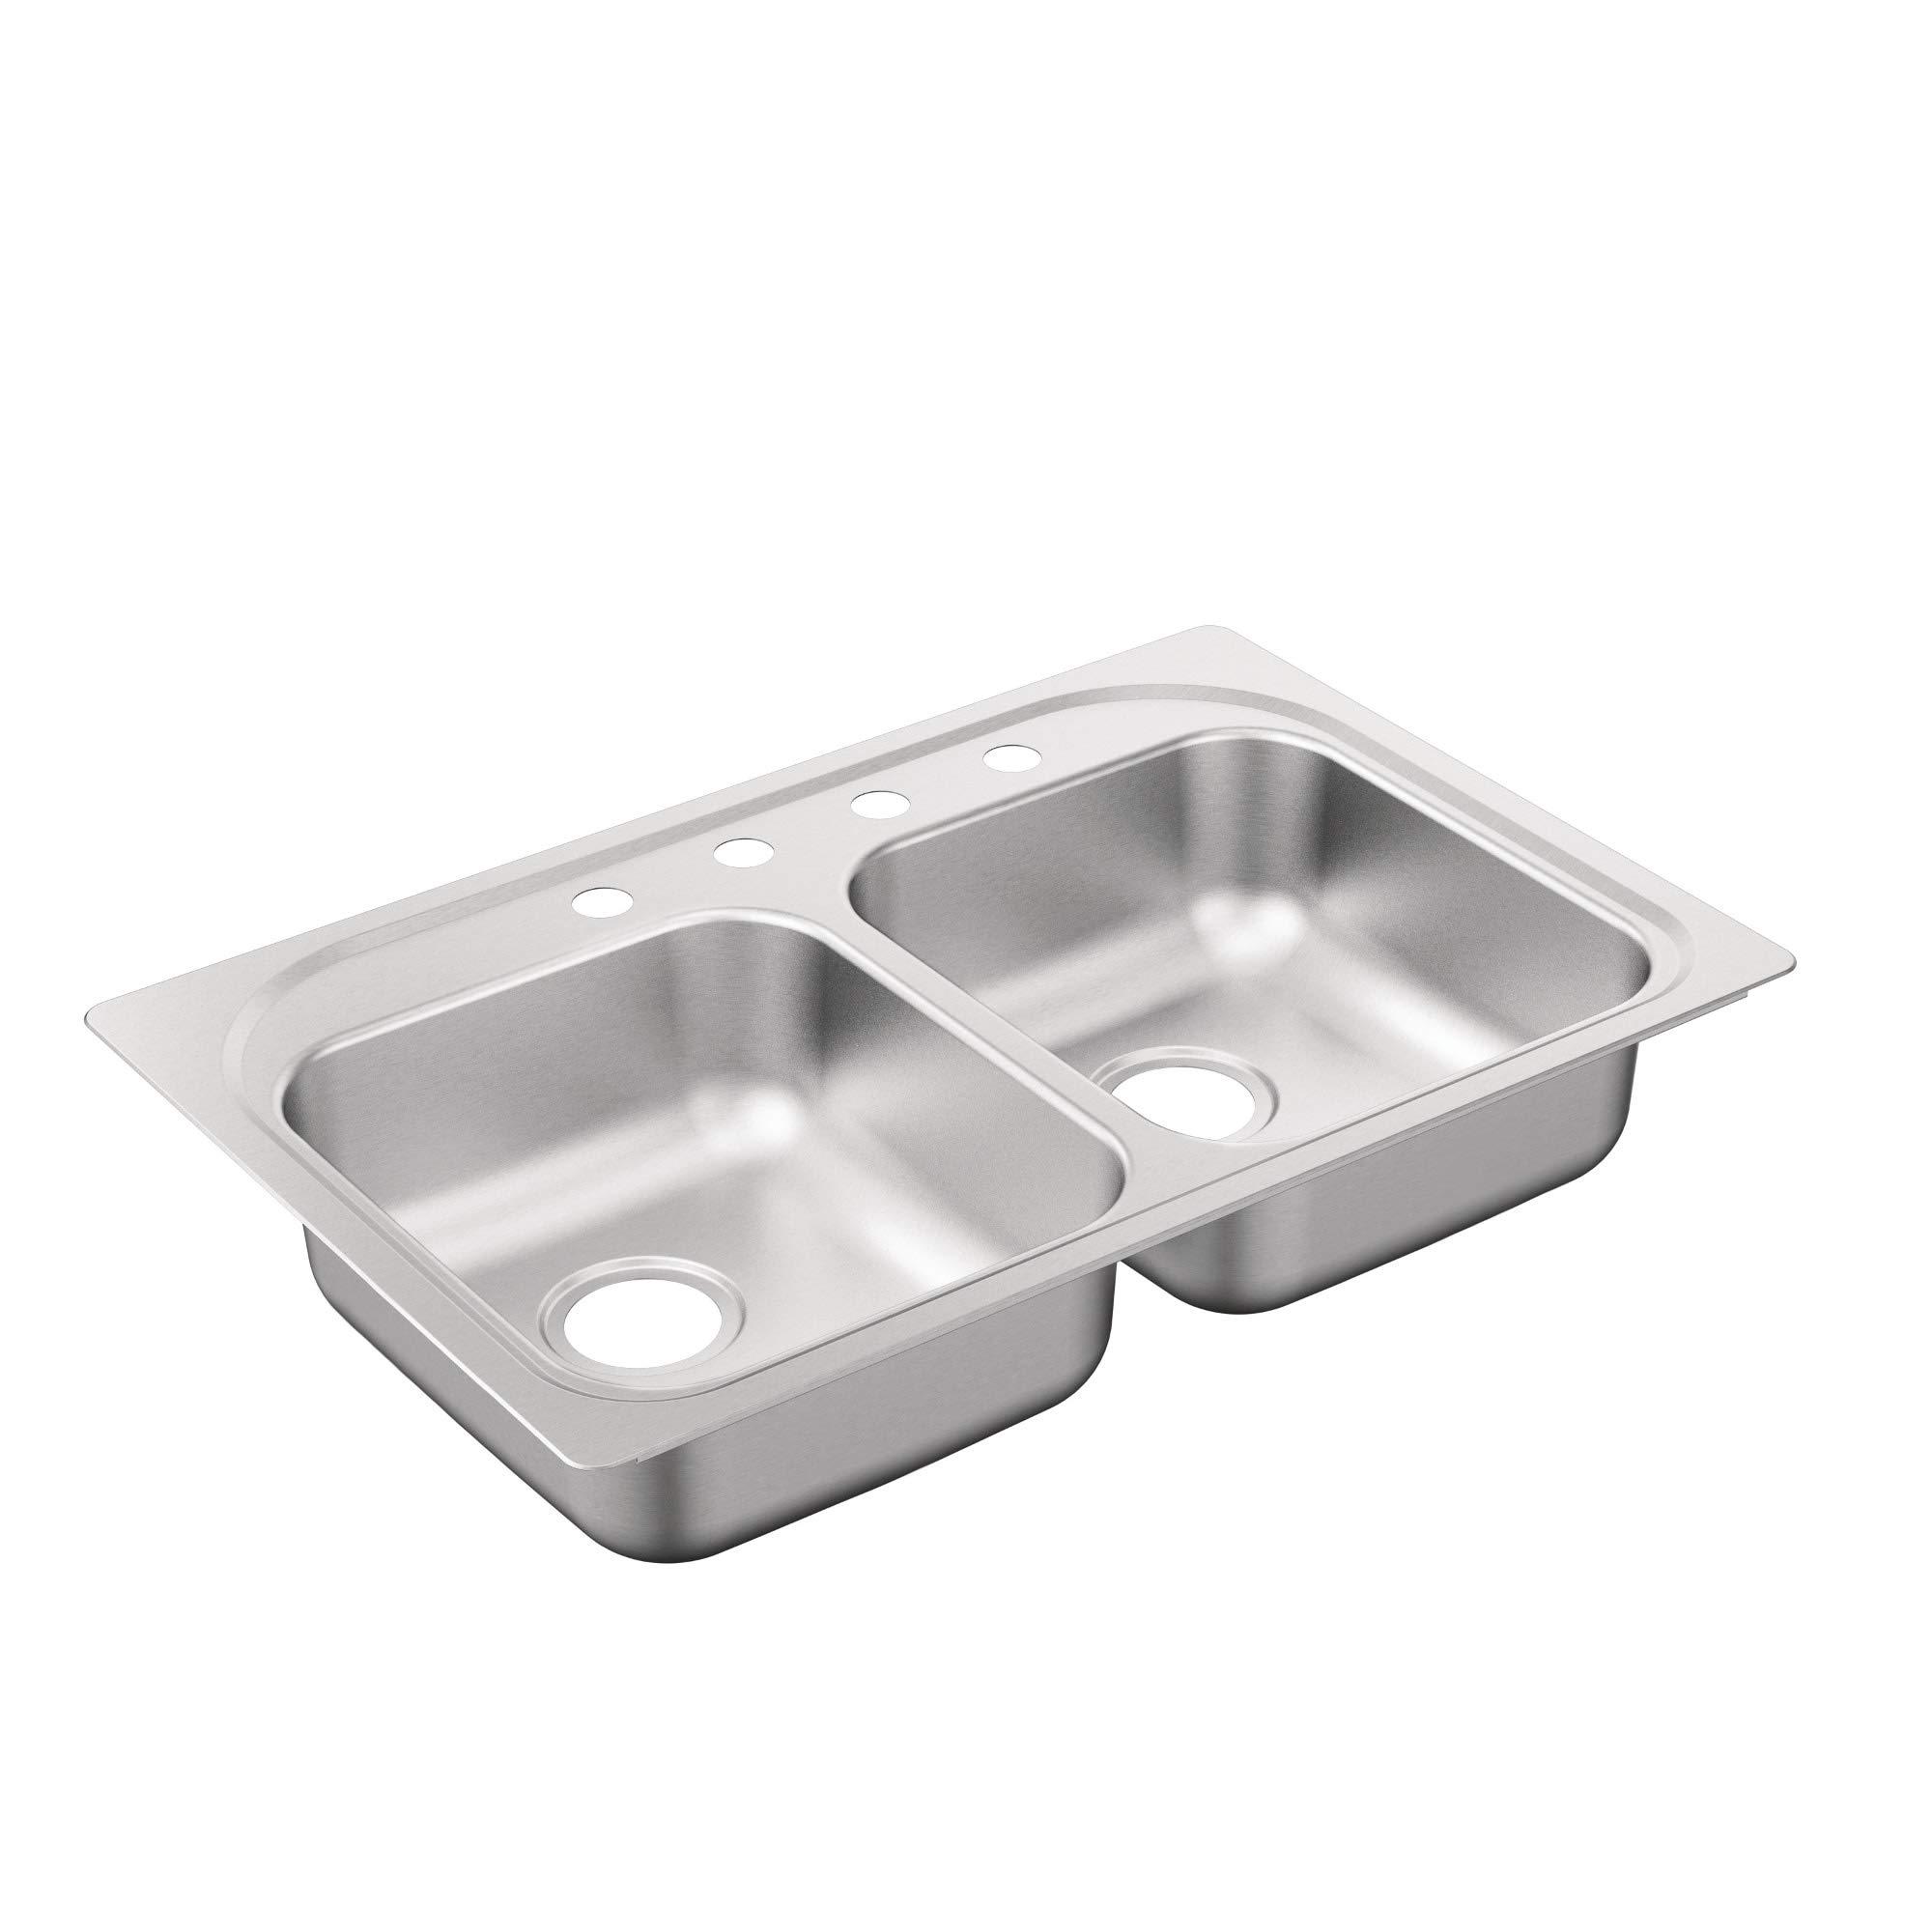 Moen G222164B 2200 Series Sink Brushed/Satin Stainless